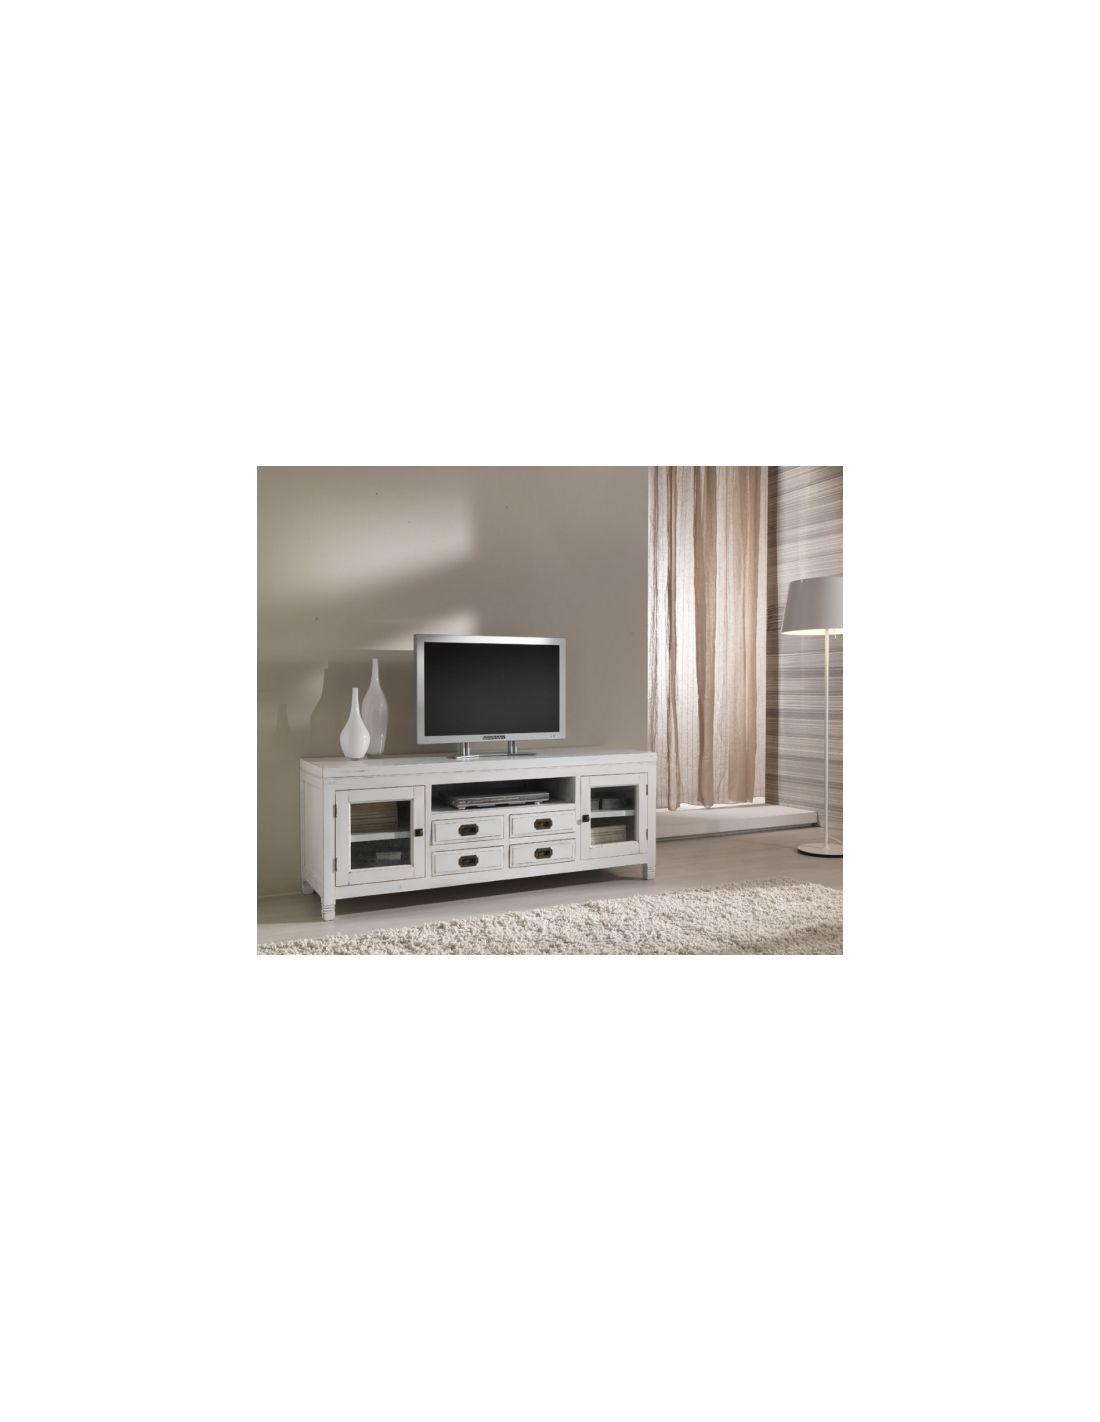 Mobile basso TV Linear - eSAEM.it Rosa Splendiani Etnico & Coloniale